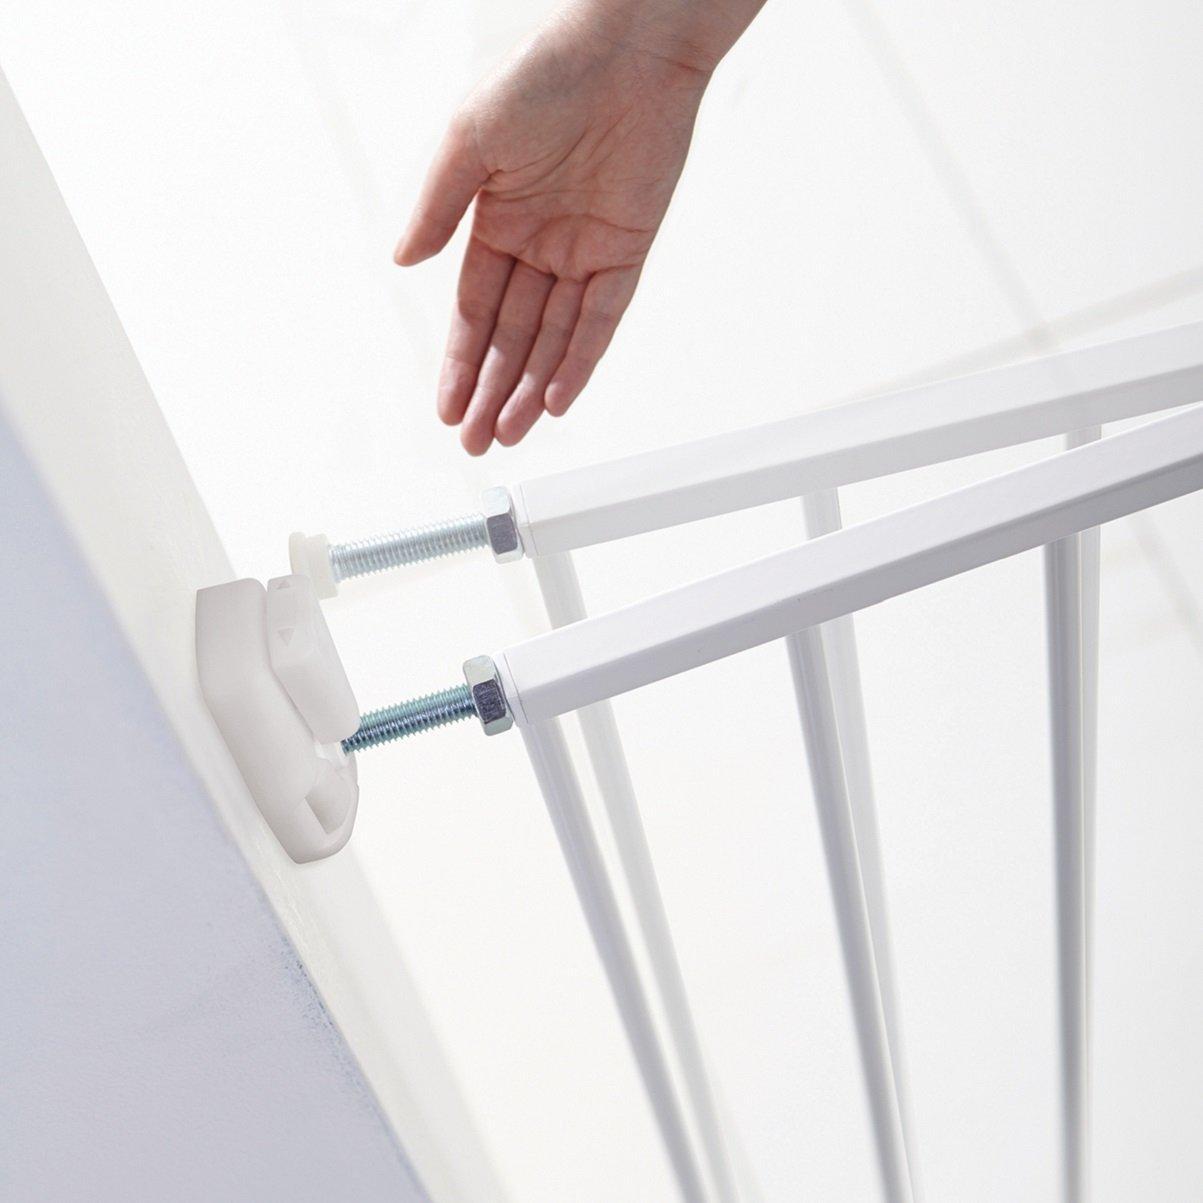 Munchkin Extending Metal Wall Fix Safety Gate  - Munchkin